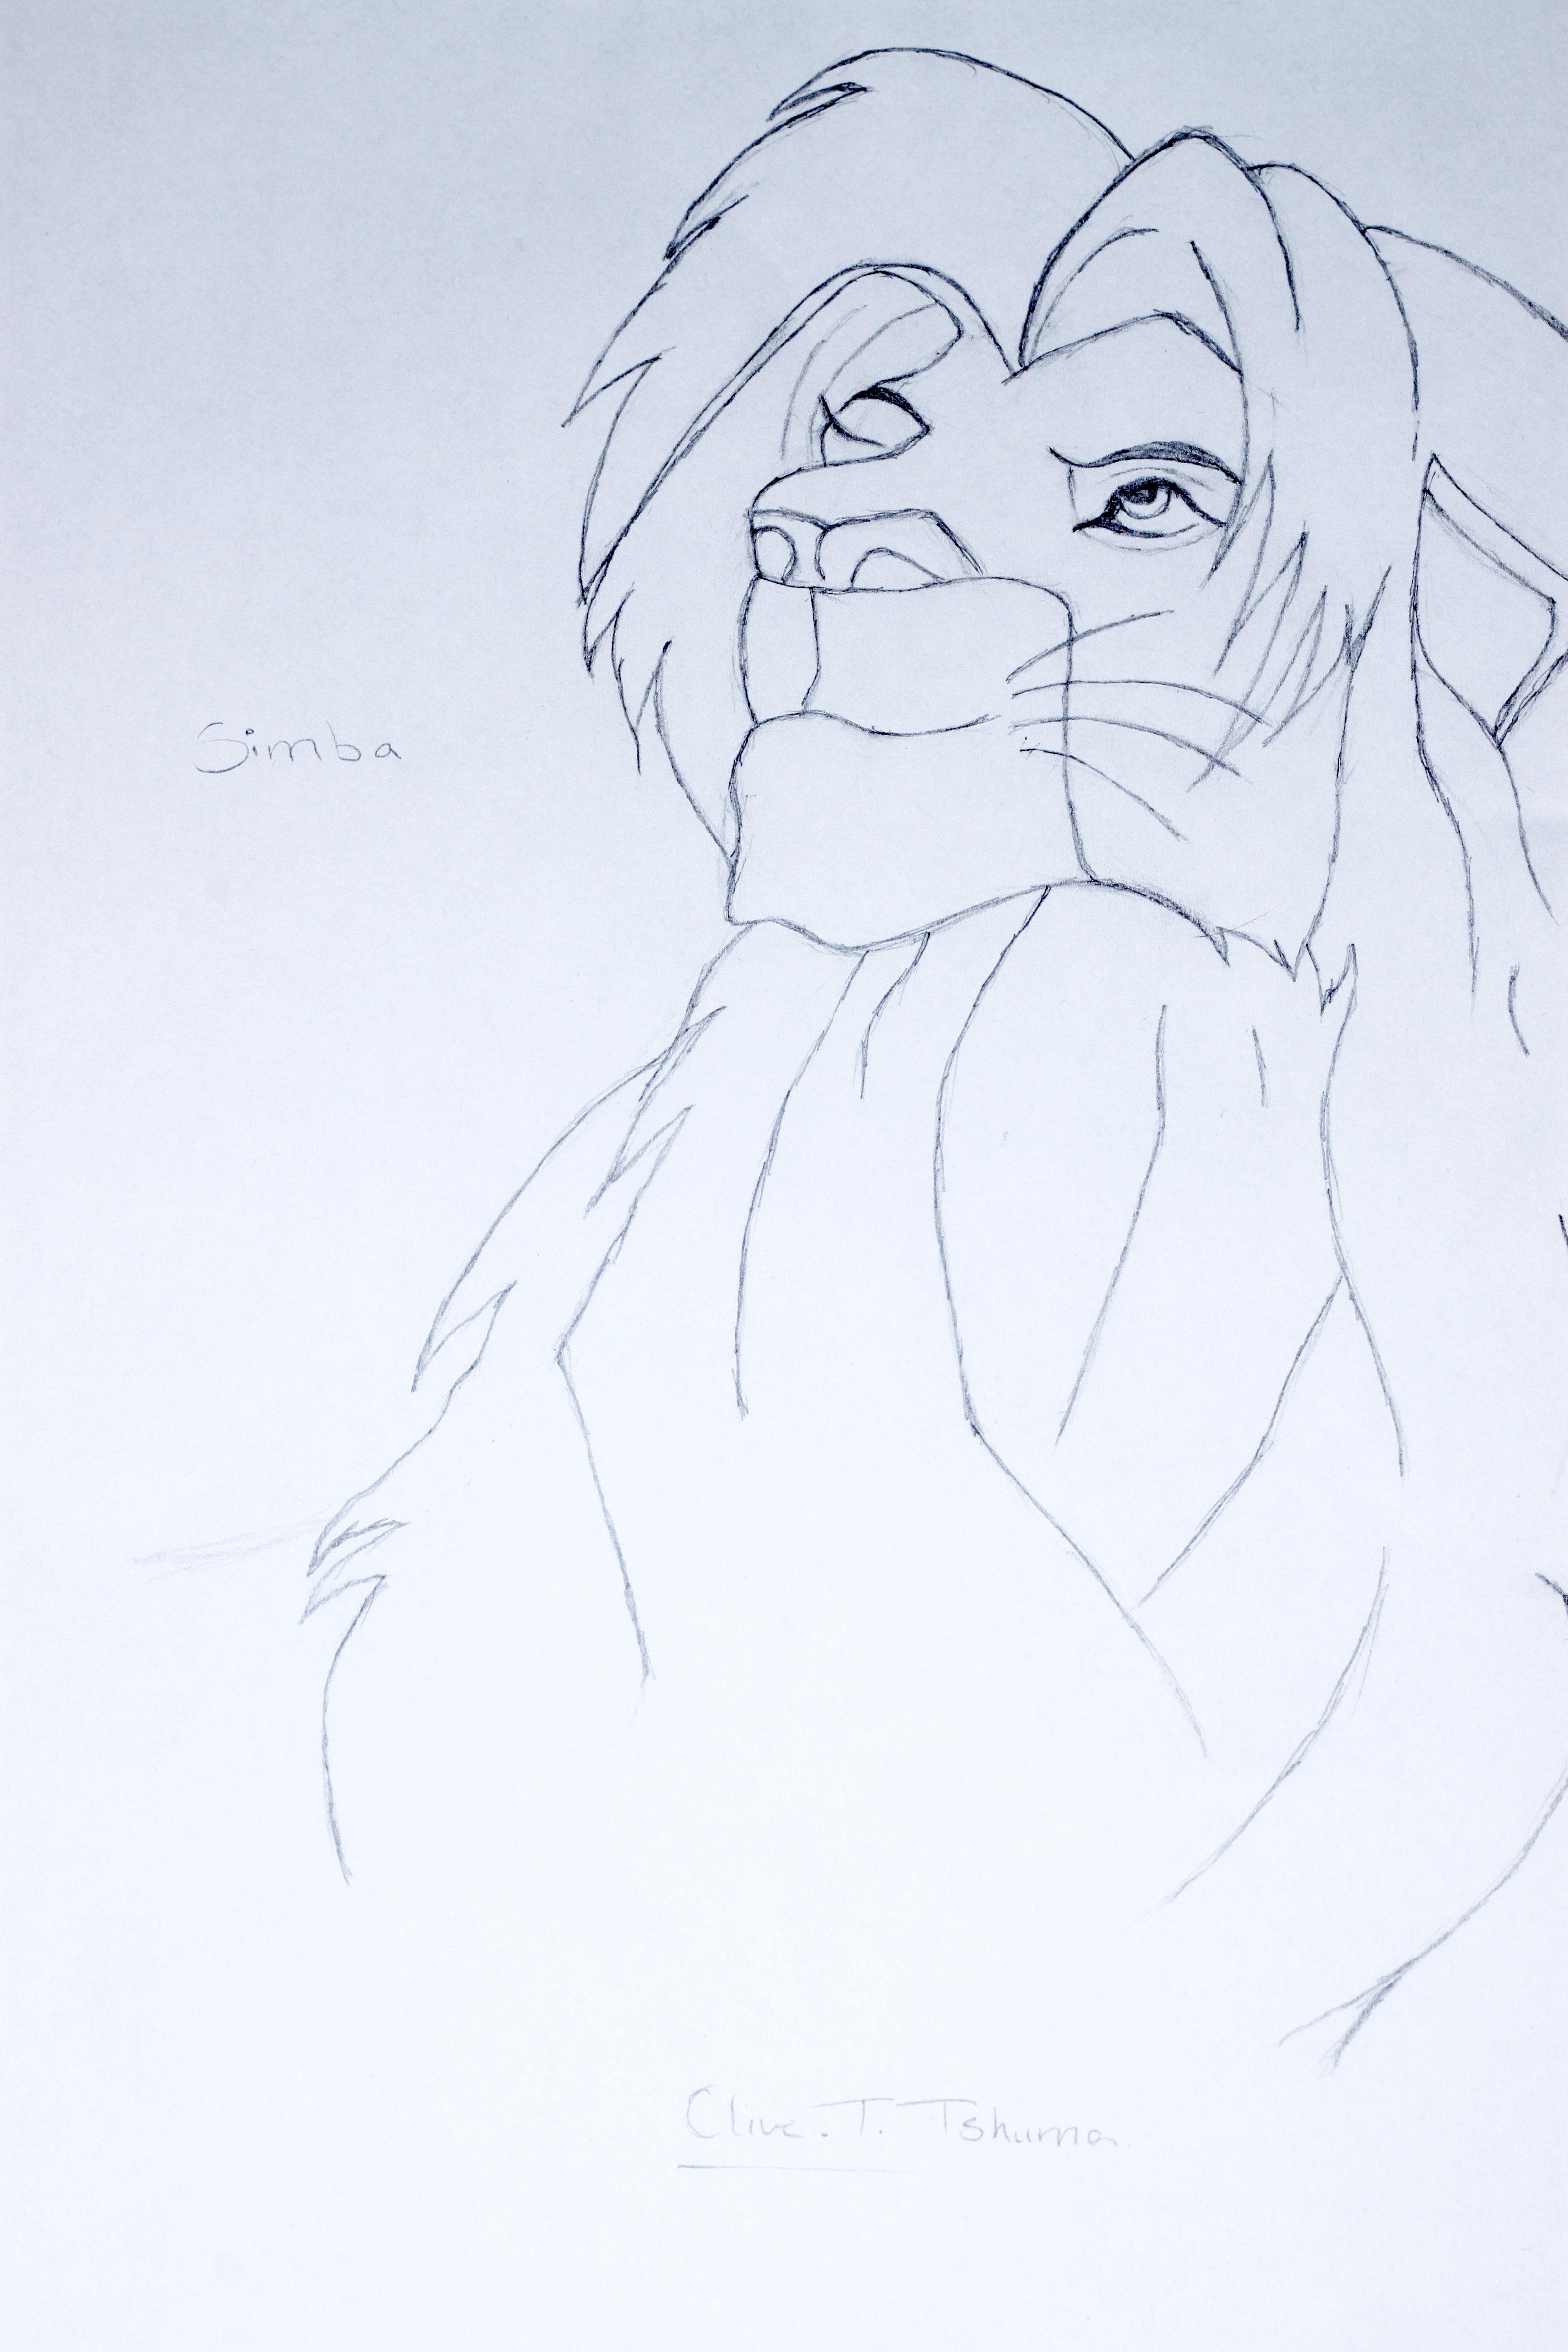 Simba - Lion King